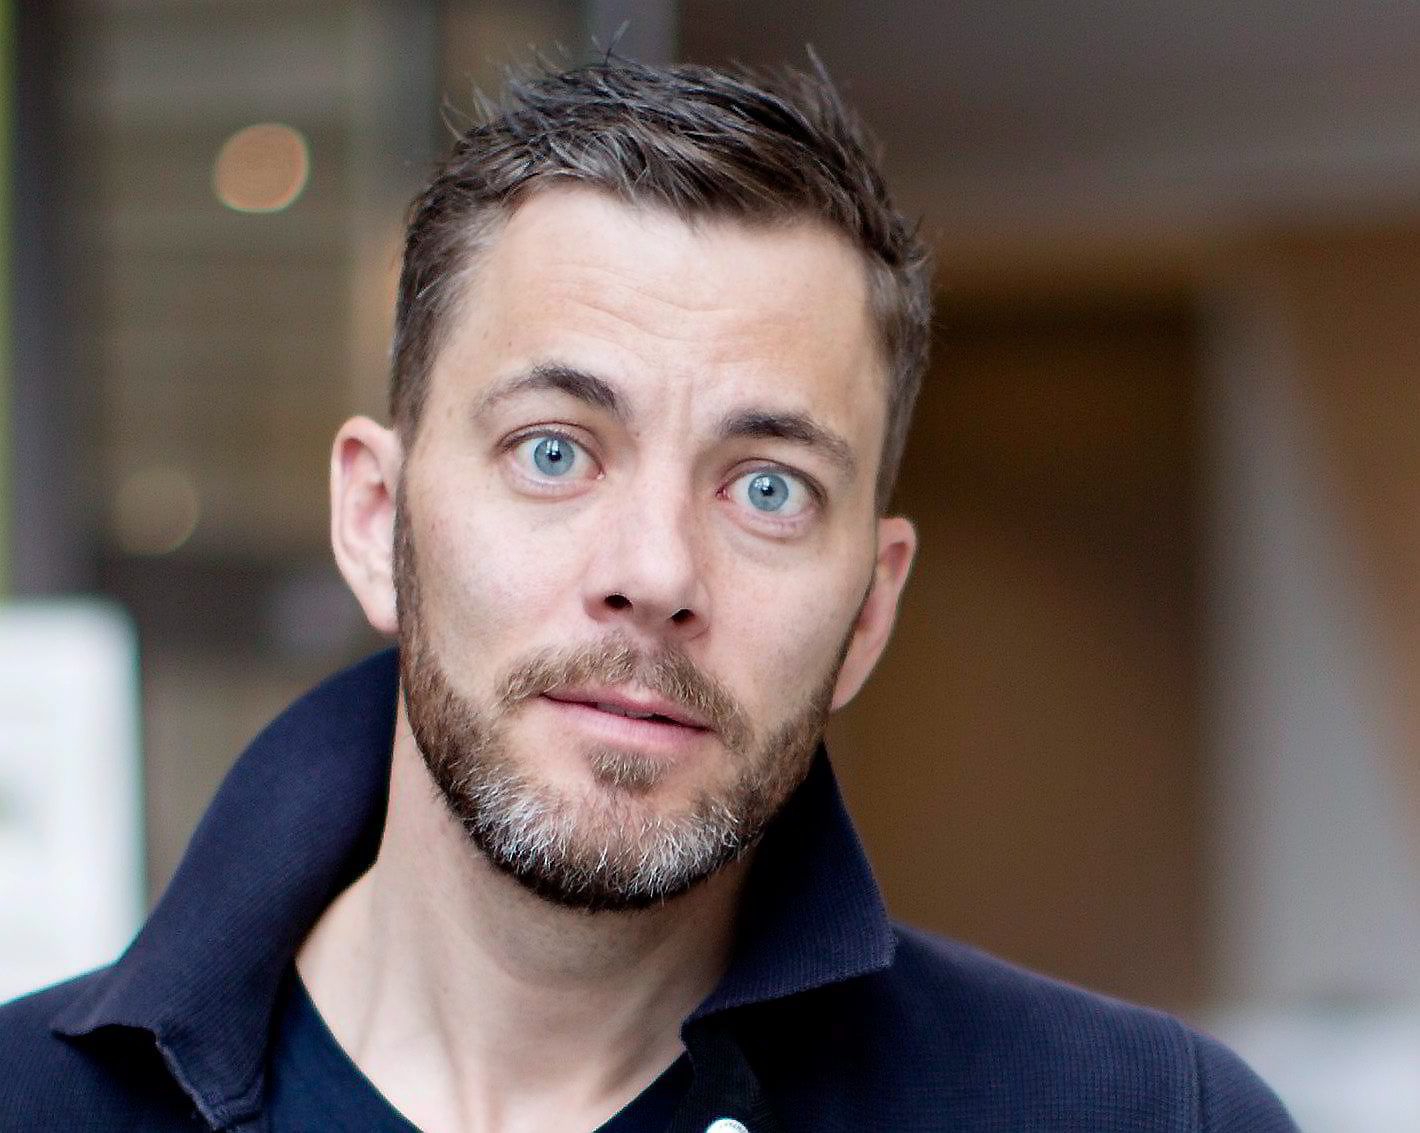 Produktdirektør Andreas Thorsheim (35) i Opera Software satser på nettvarder. Foto: